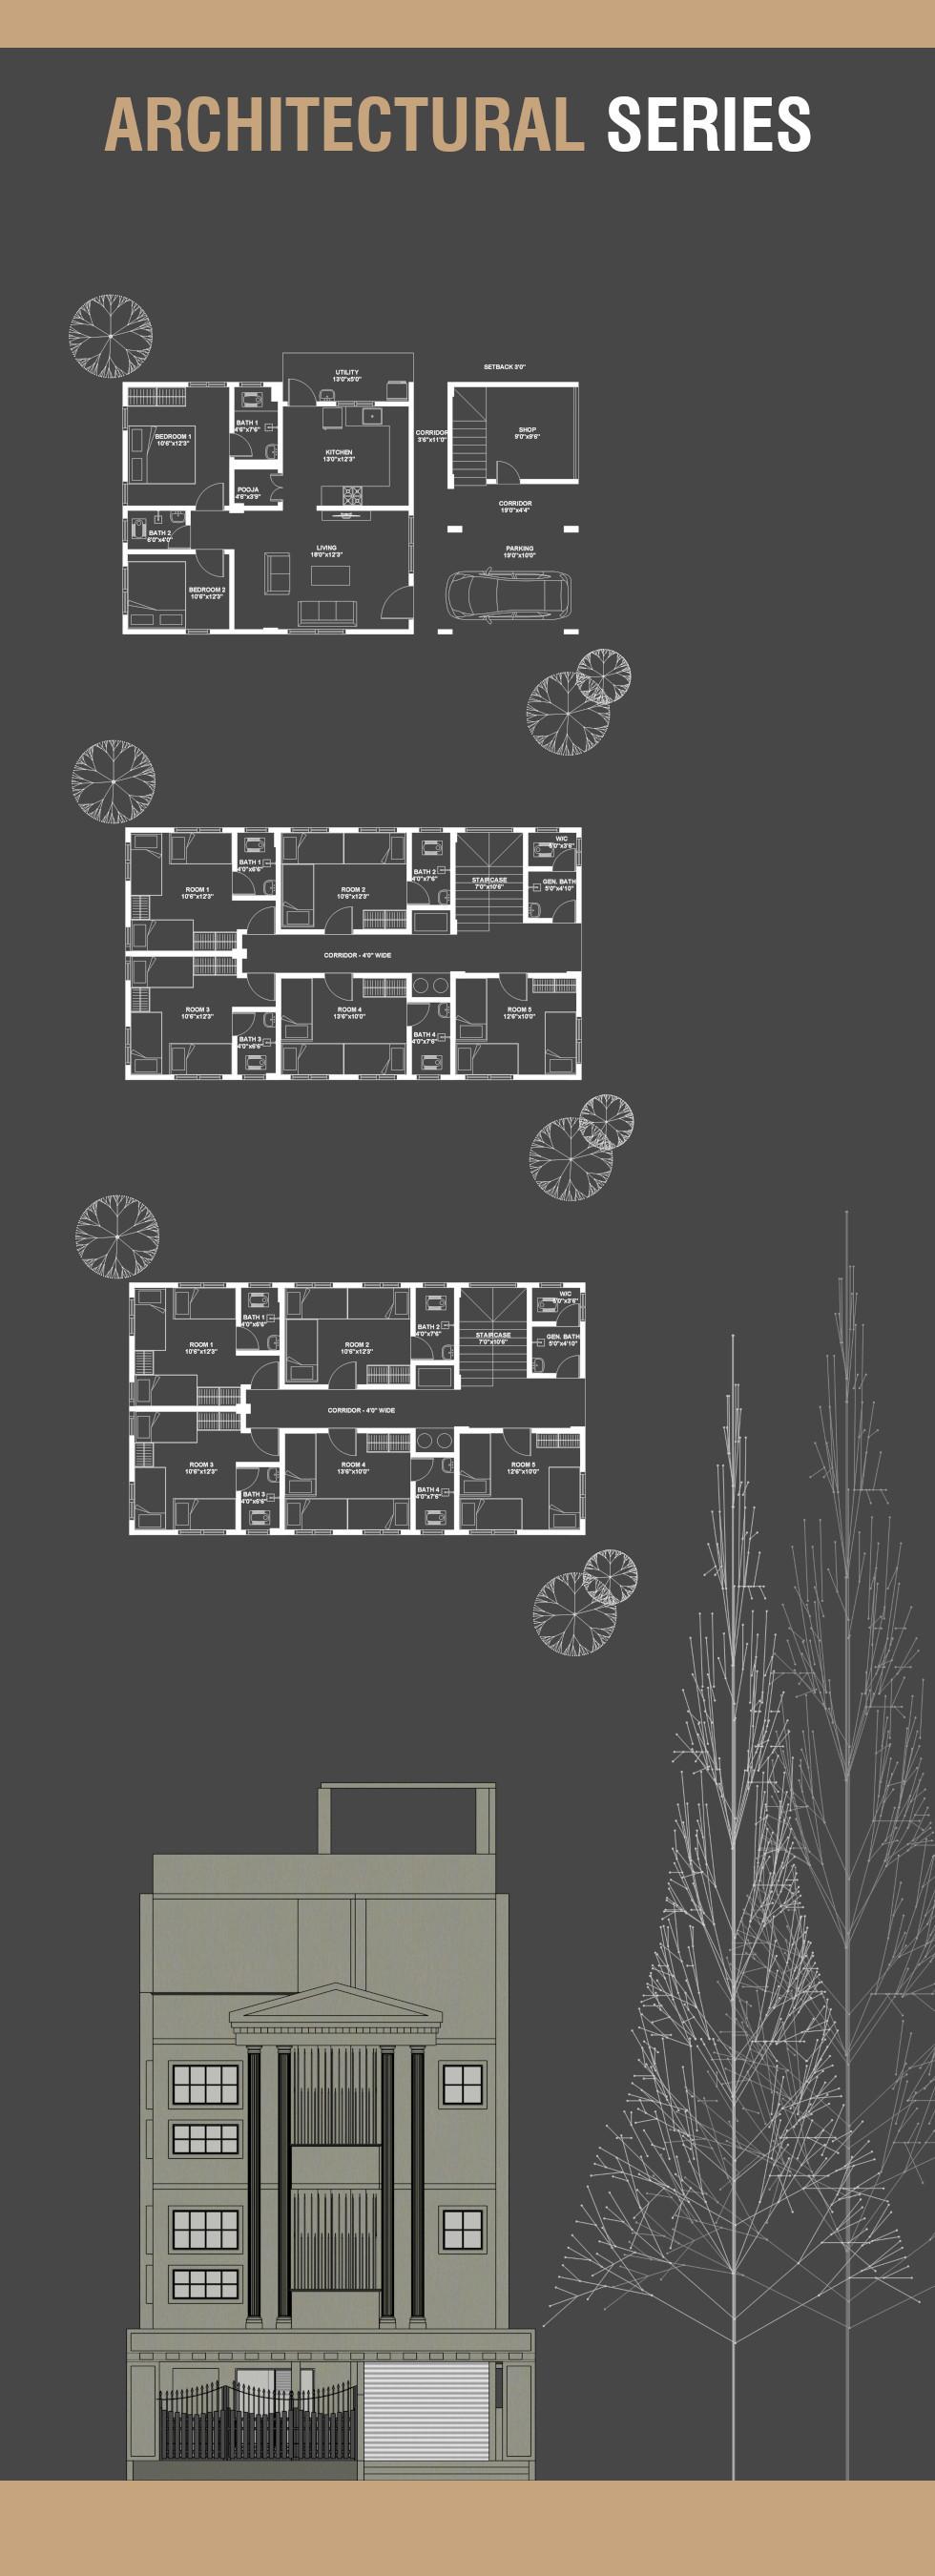 architectural board.jpg